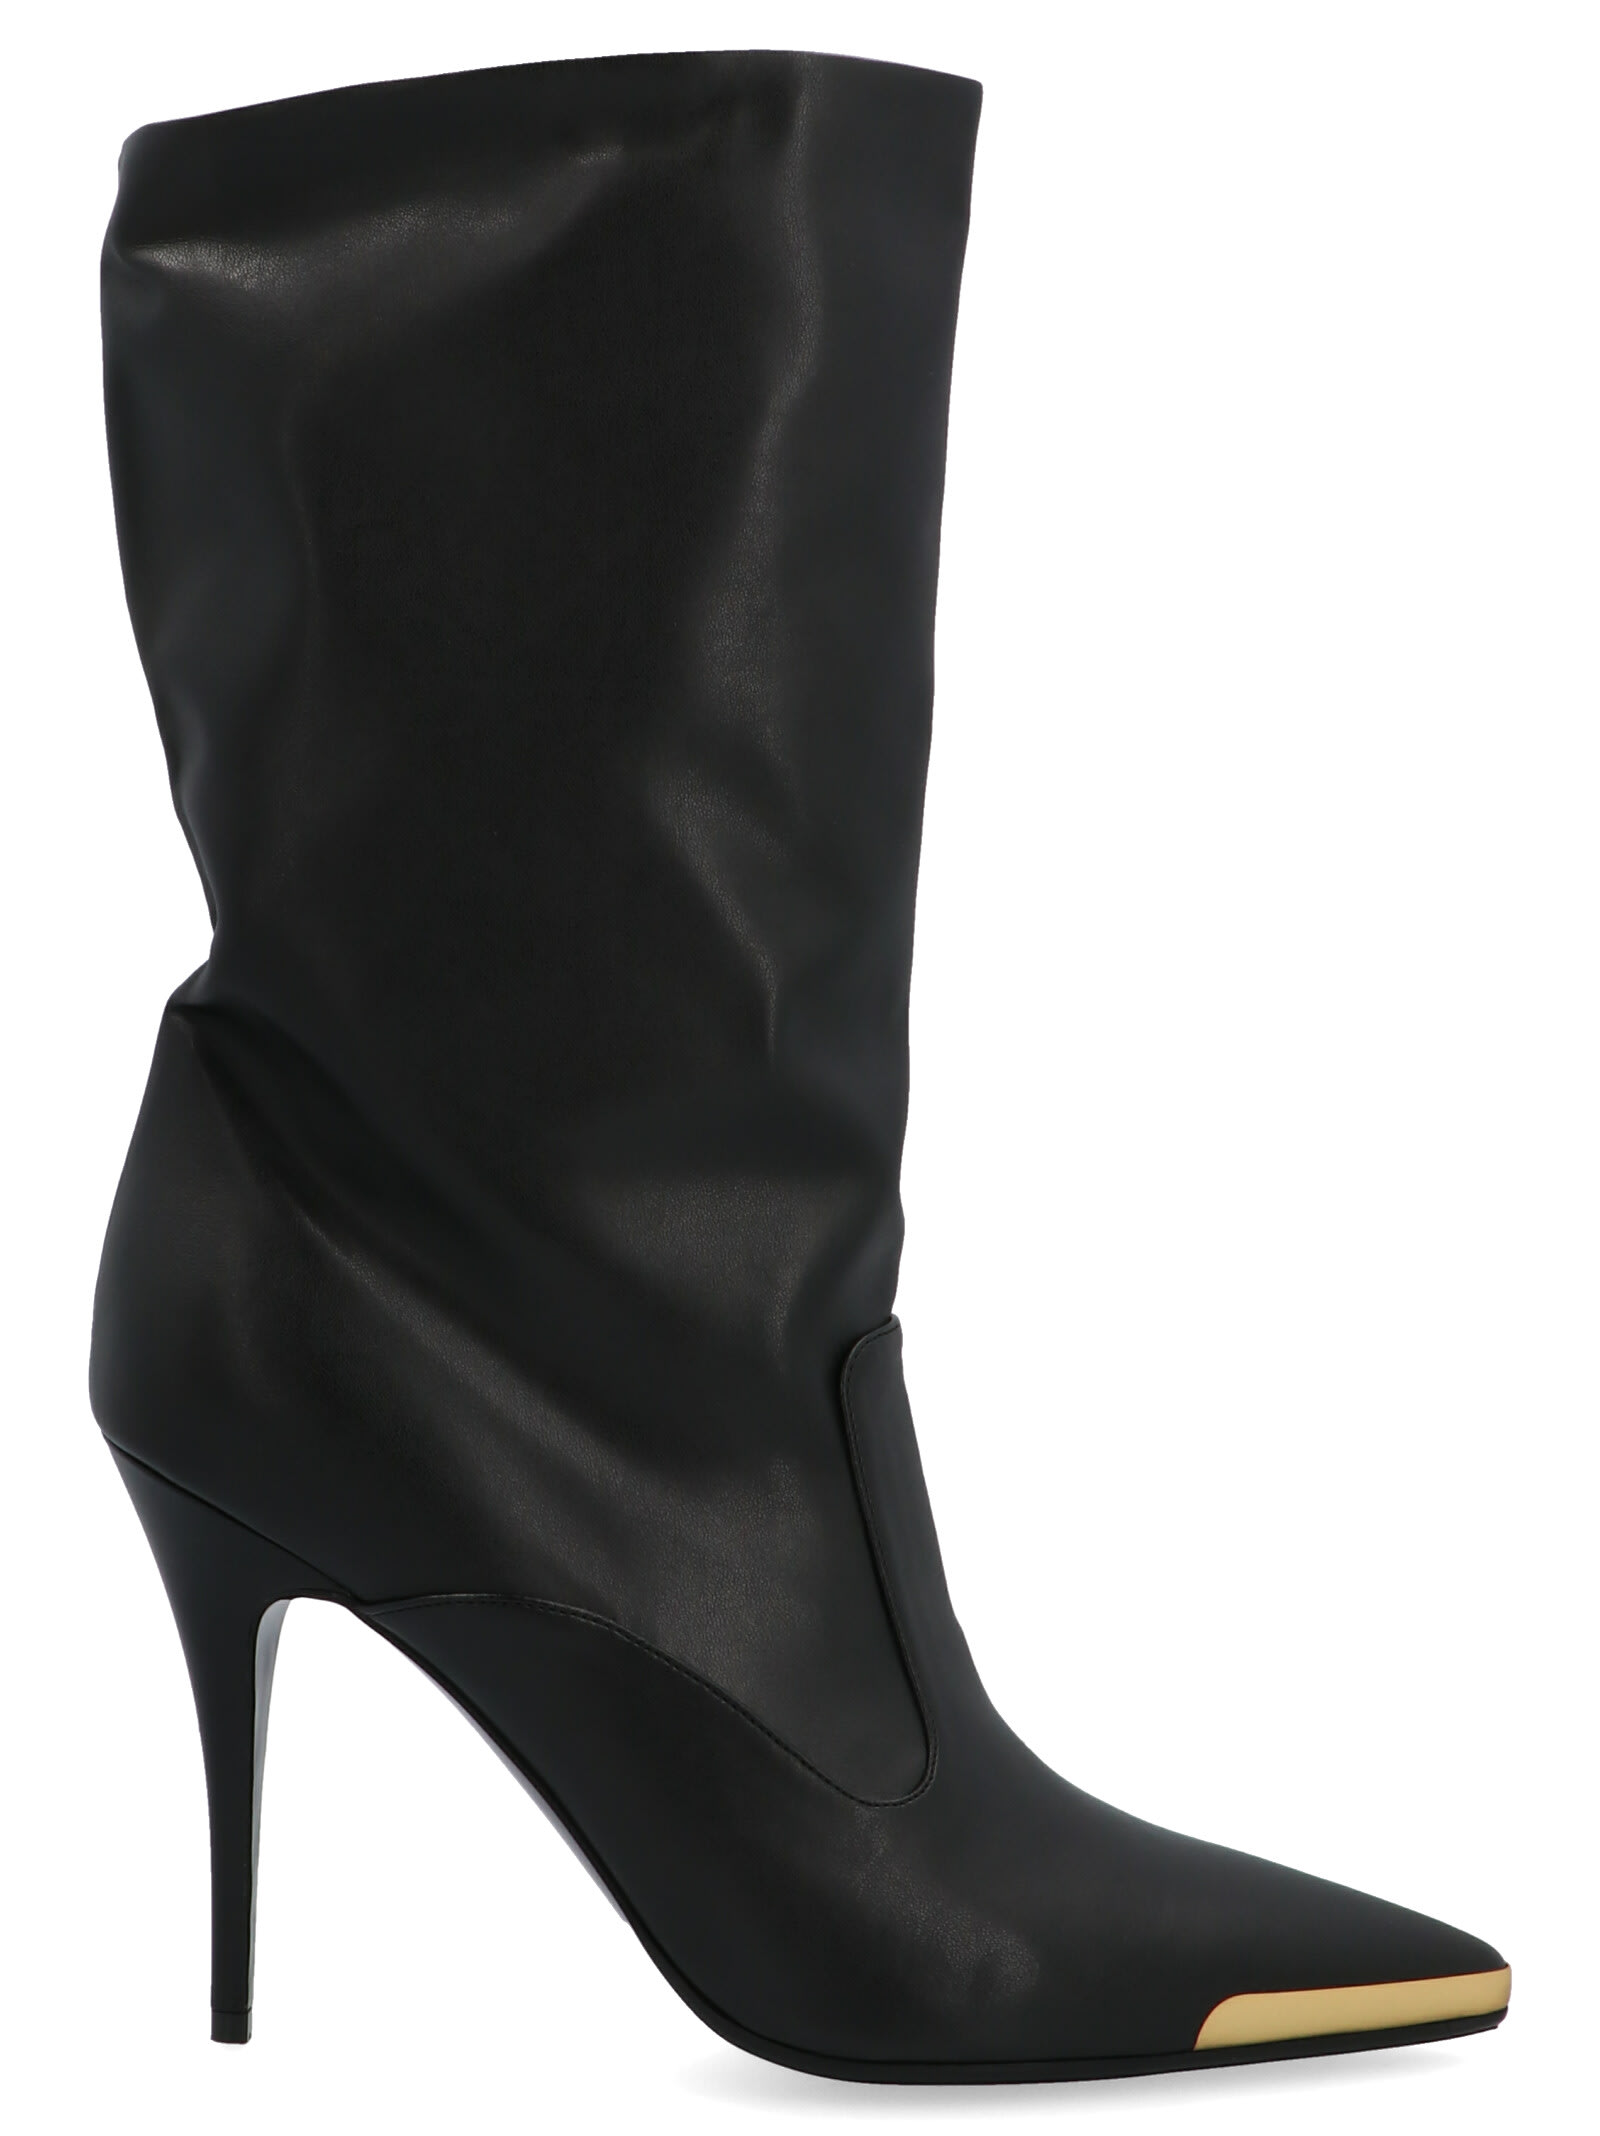 Buy Stella Mccartney pamir Shoes online, shop Stella McCartney shoes with free shipping